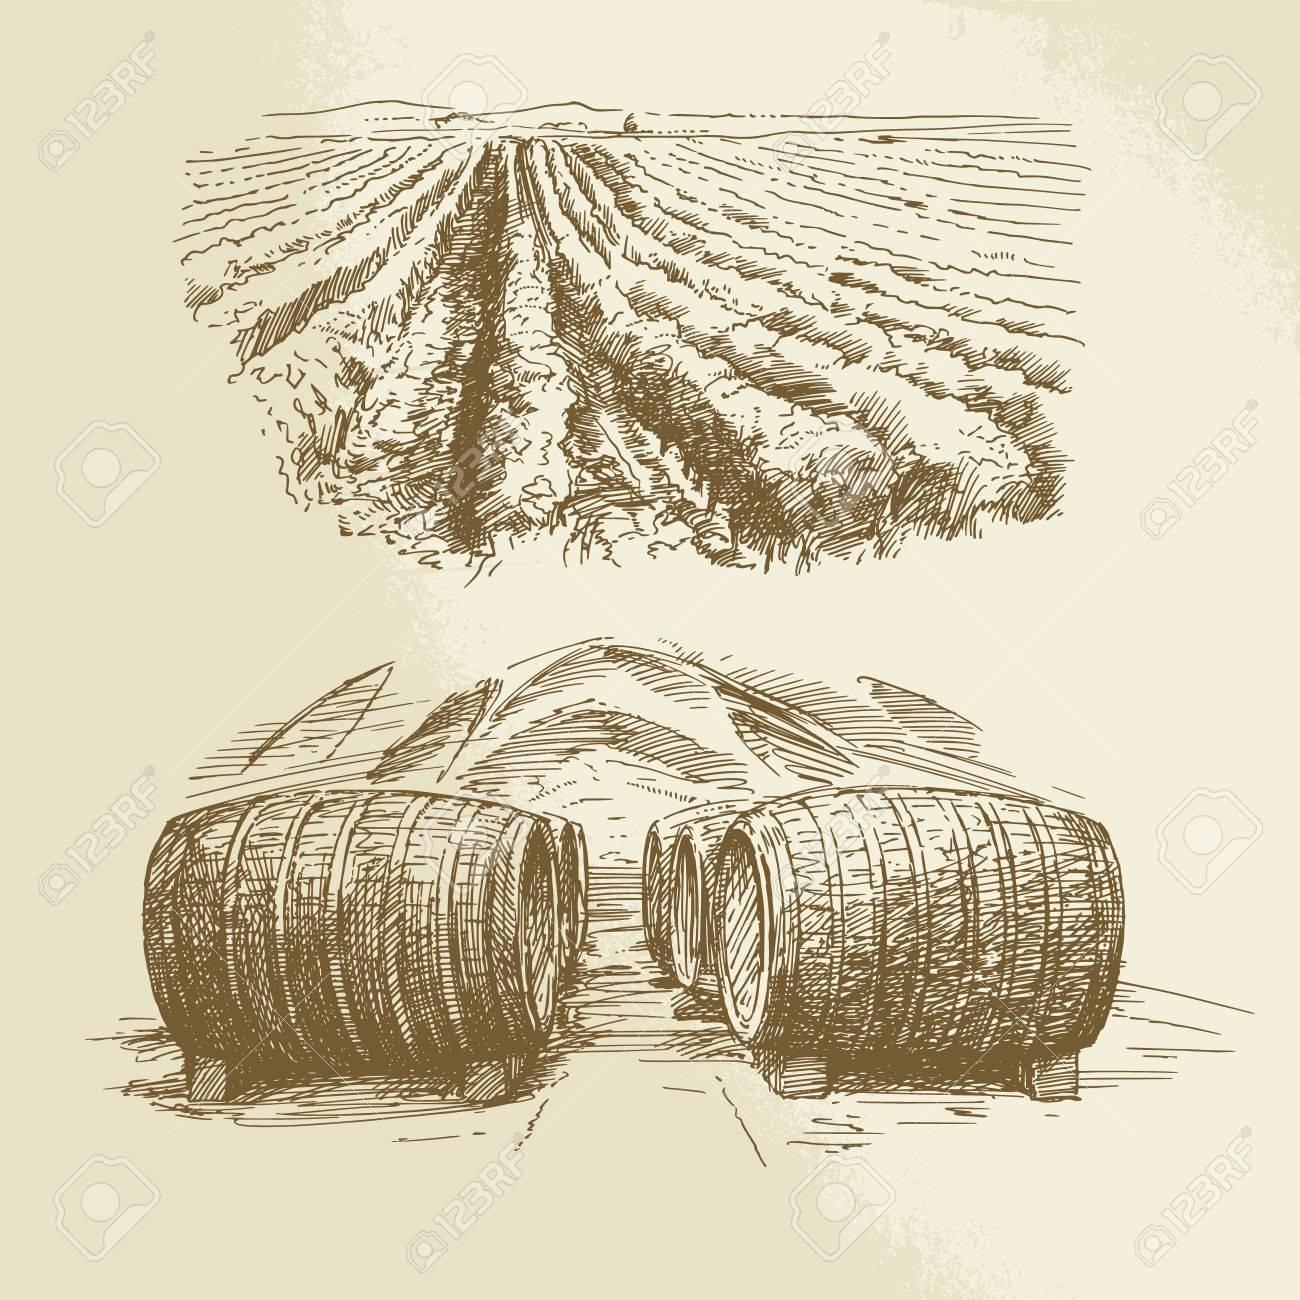 barrels, vineyard, harvest, farm - hand drawn collection Standard-Bild - 35717829